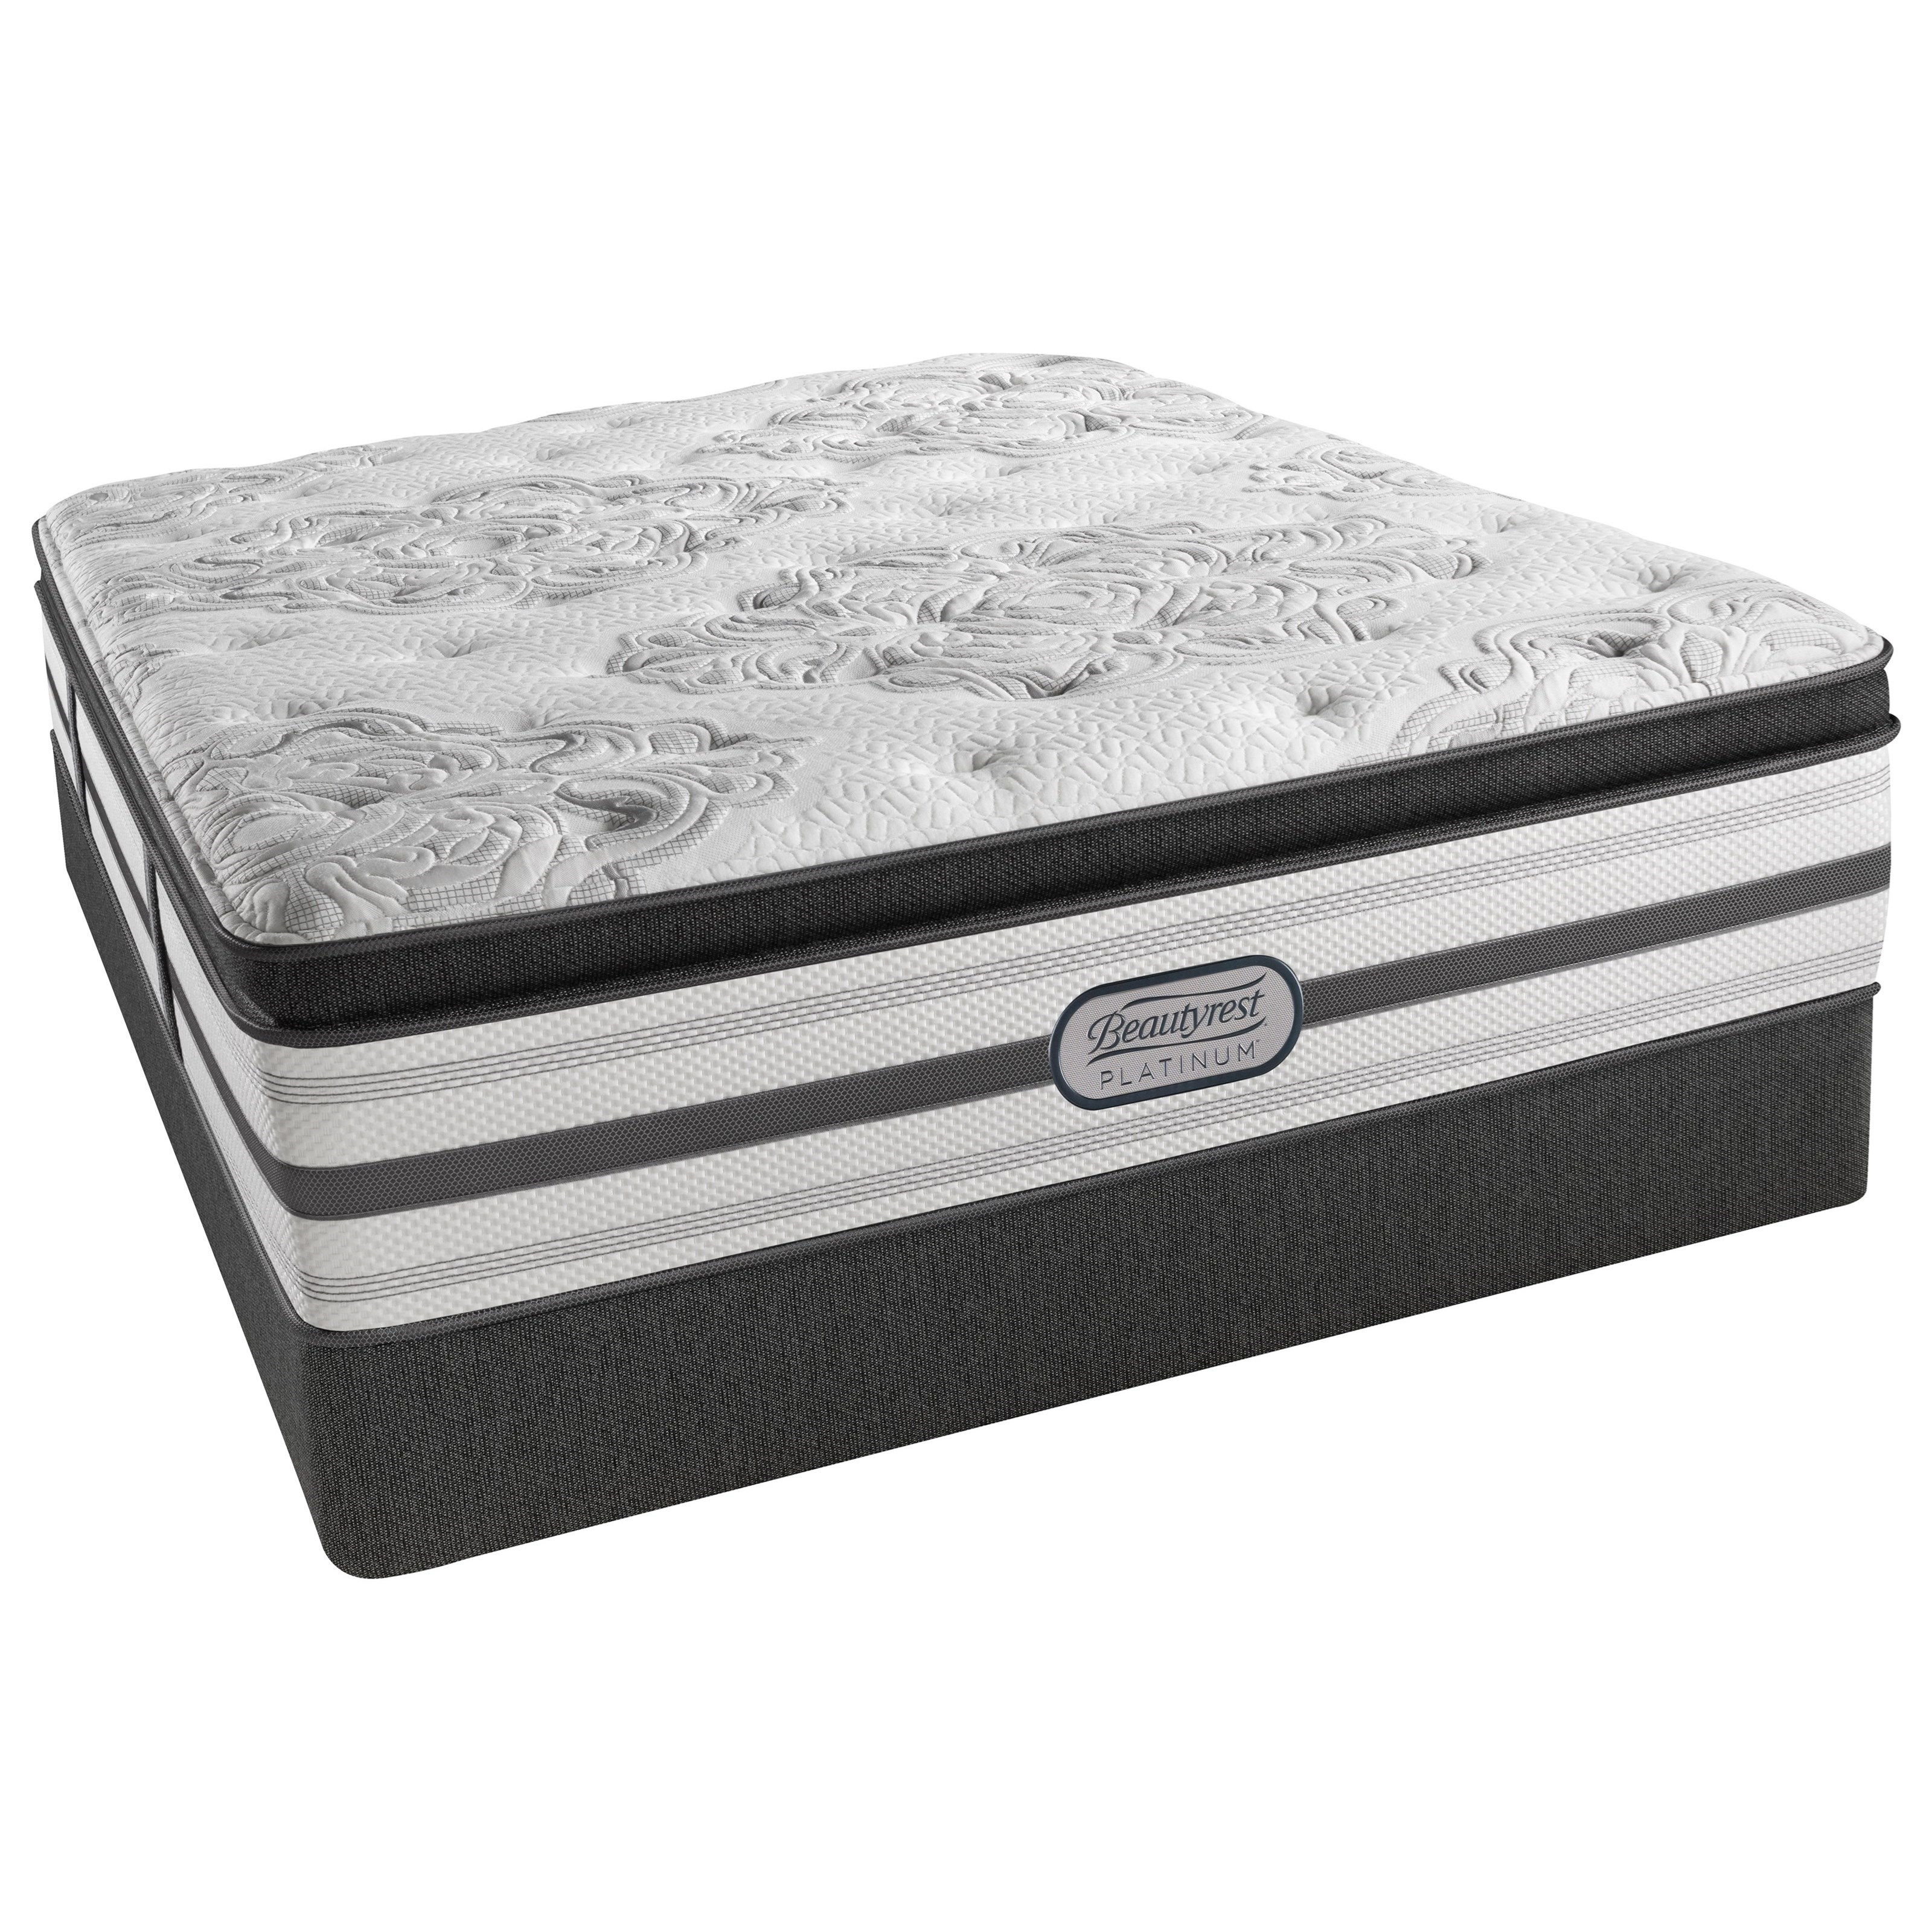 "Simmons Belgrade Plush PT Queen Plush Pillow Top 15"" Low Profile Set - Item Number: LV3PLPT-Q+700600254-6050"